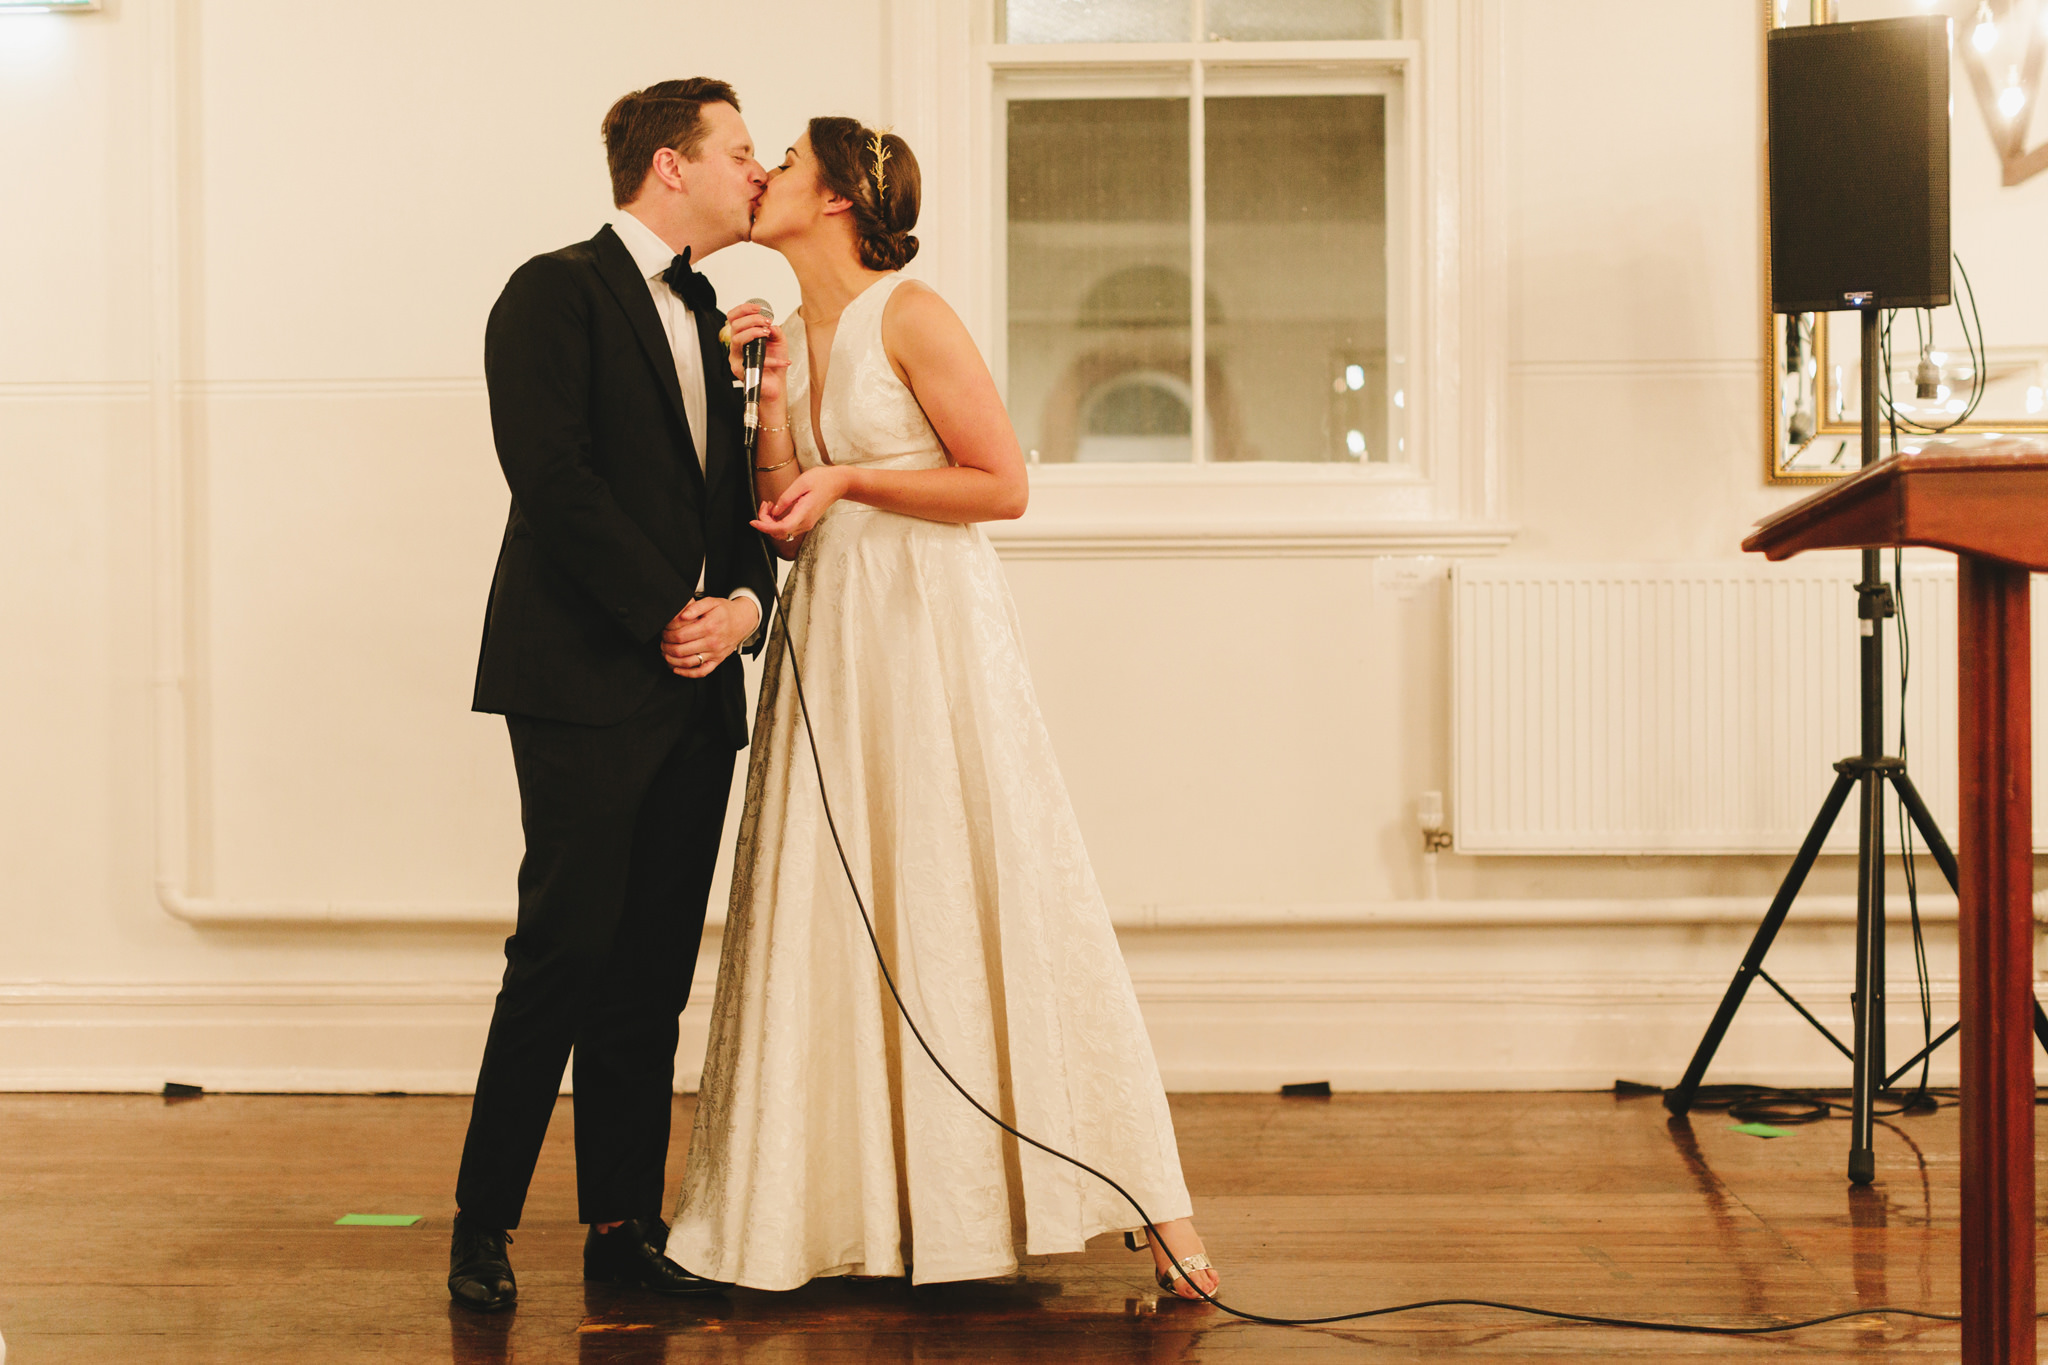 Abbotsford_Convent_Wedding_Peter_Anna130.JPG